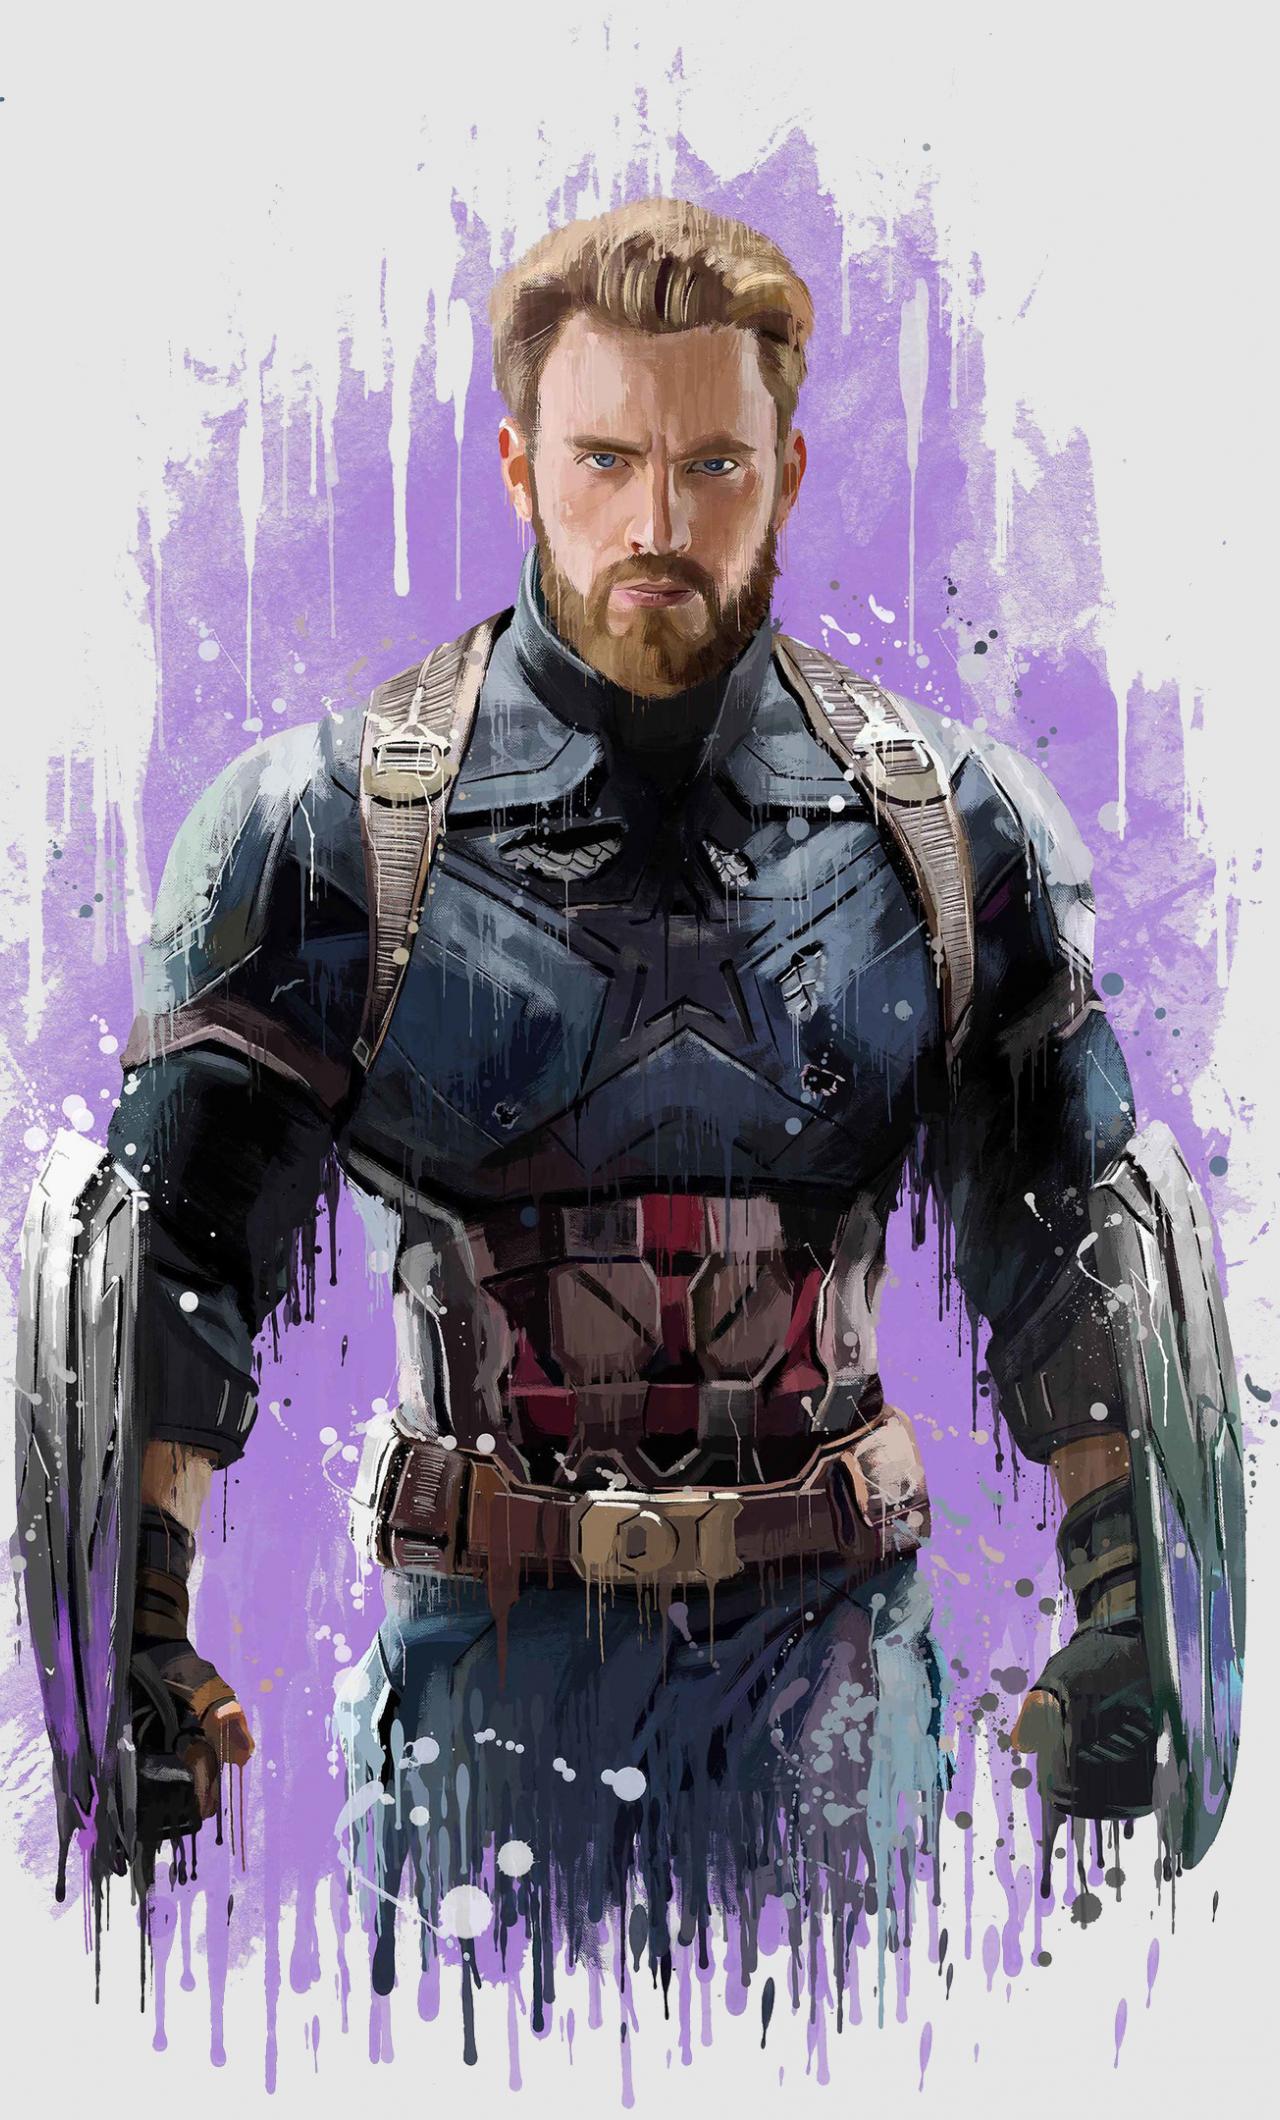 Download 1280x2120 wallpaper captain america avengers - Avengers infinity war wallpaper iphone ...